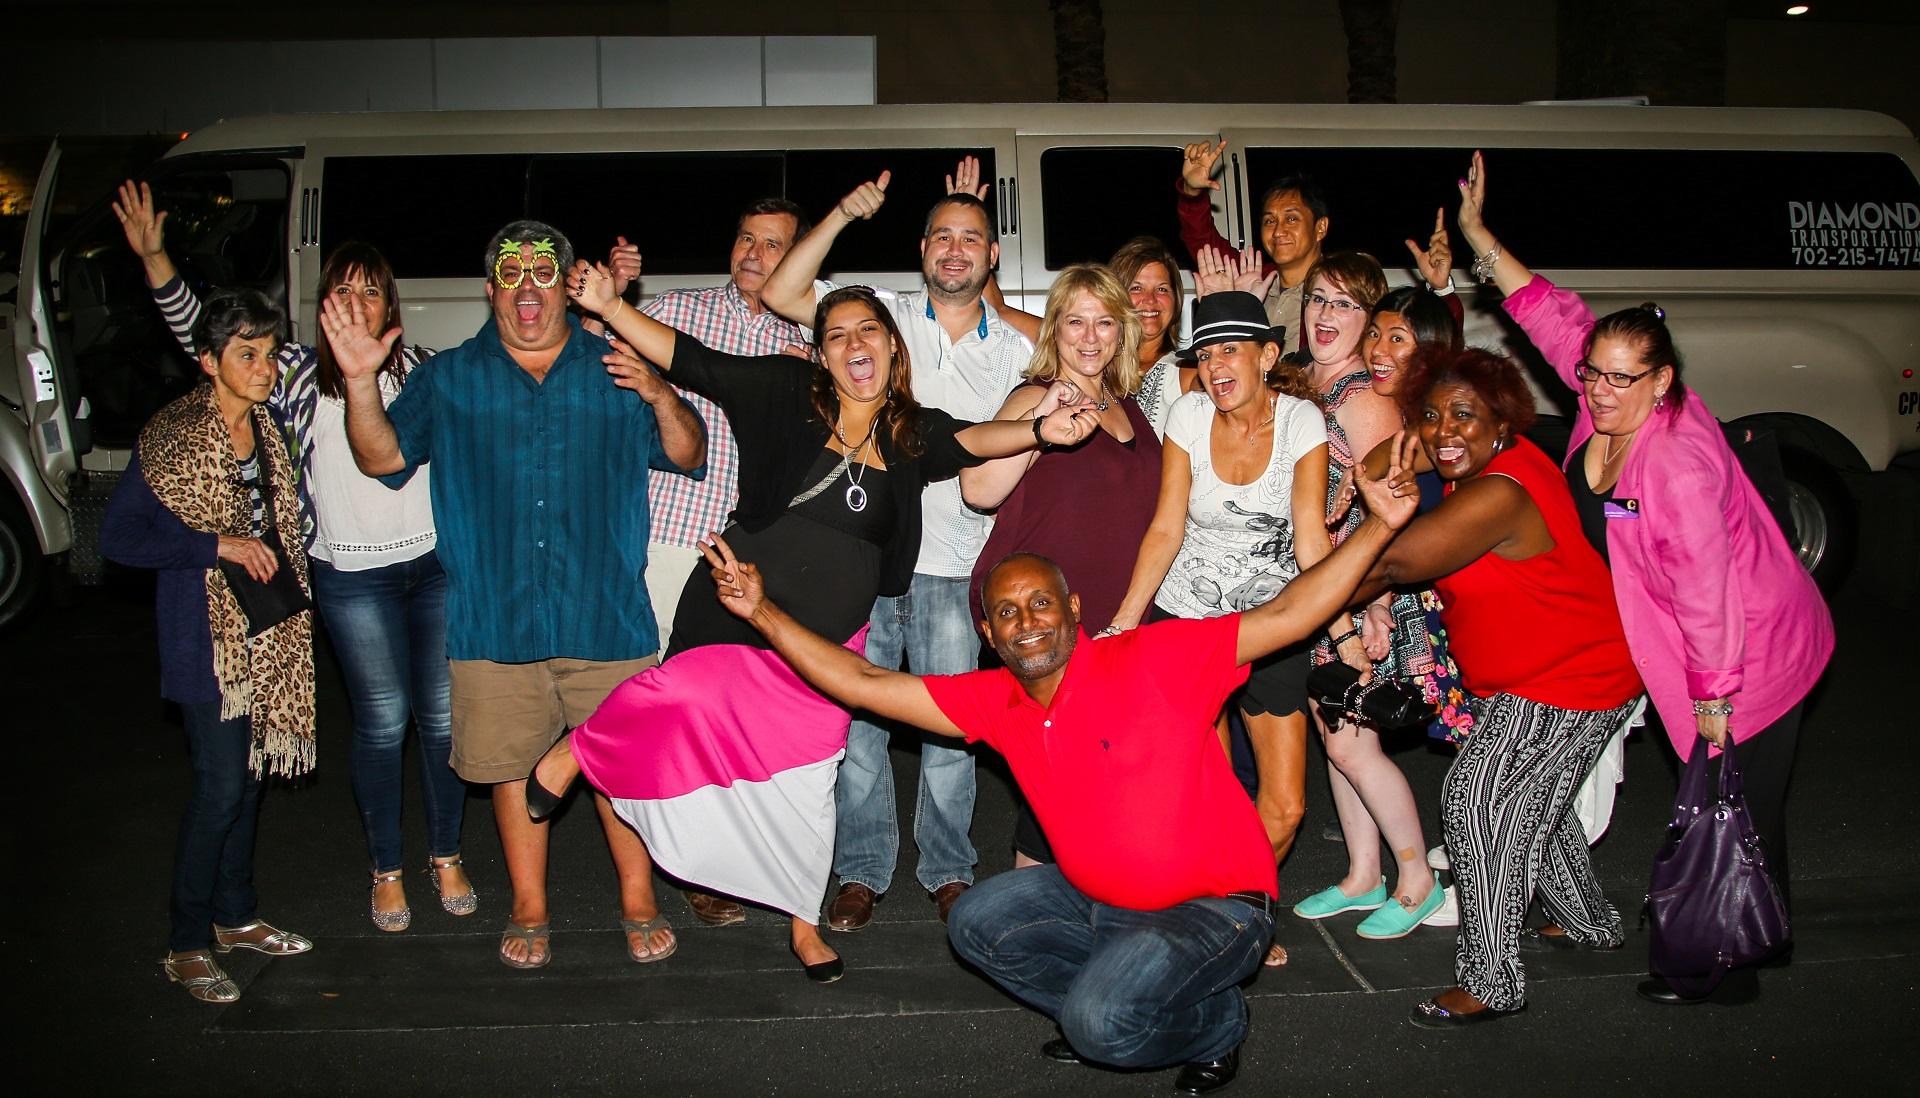 2017 Las Vegas Wedding and Bachelorette Familiarization Tour